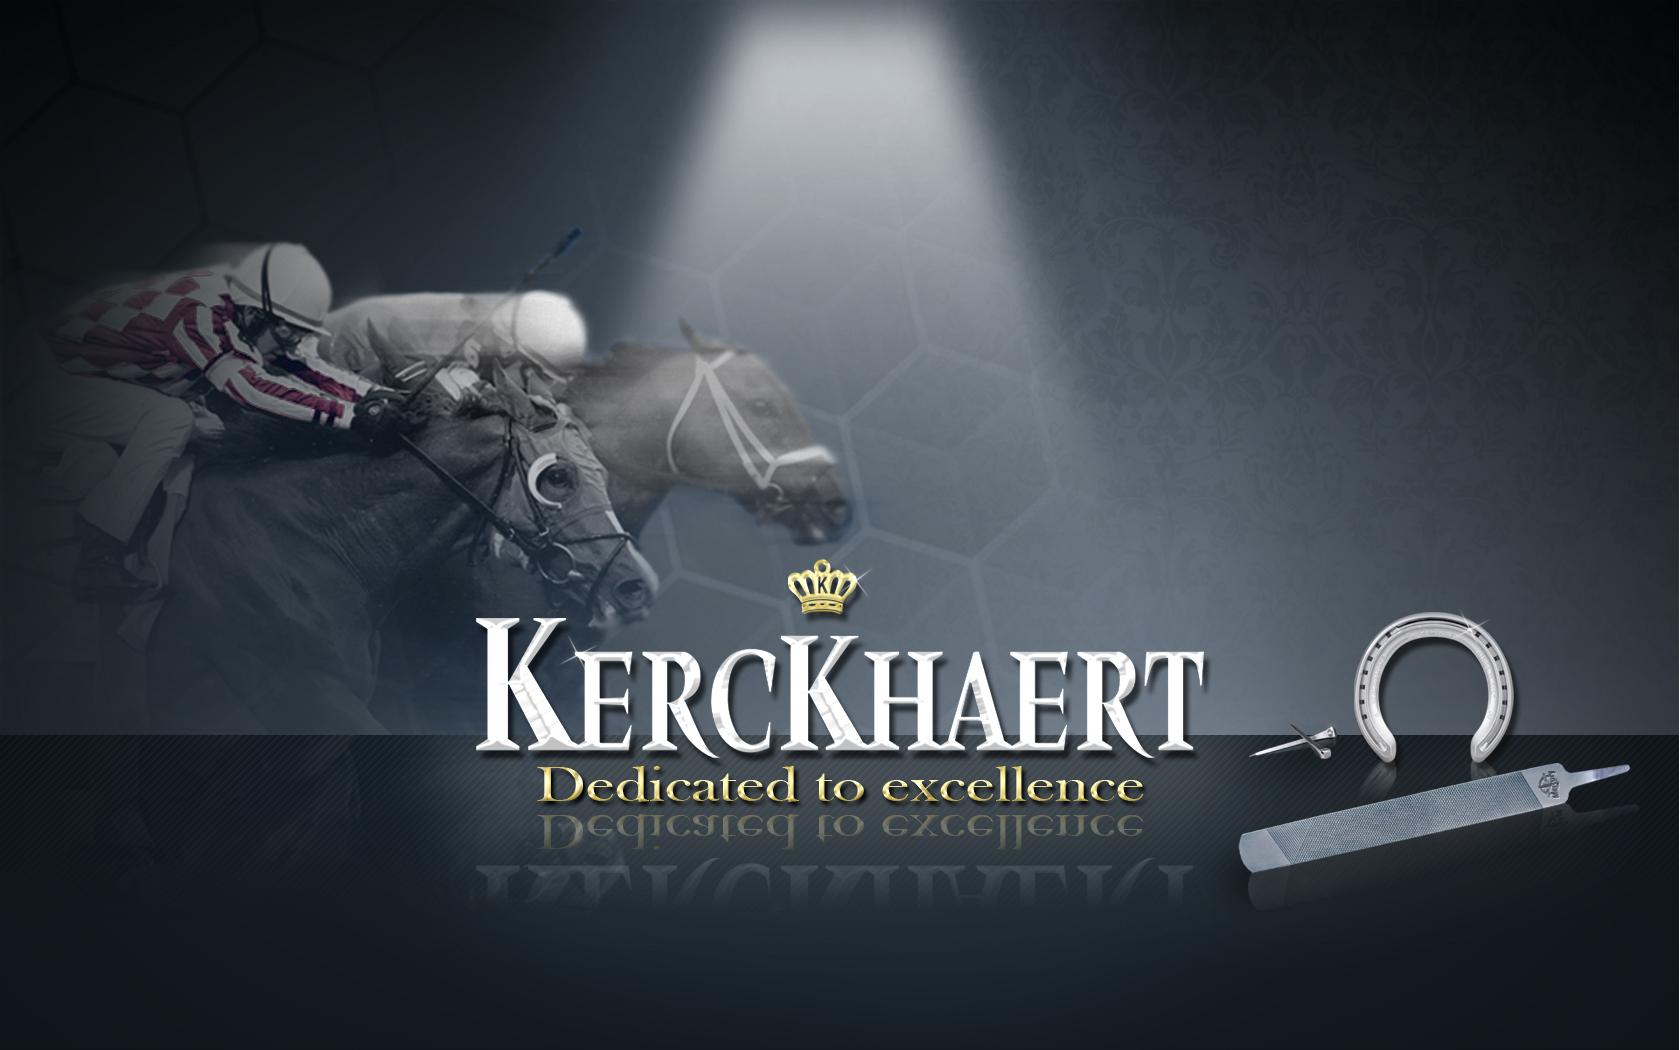 Kerckhaert-Wallpaper-1680x1050.jpg